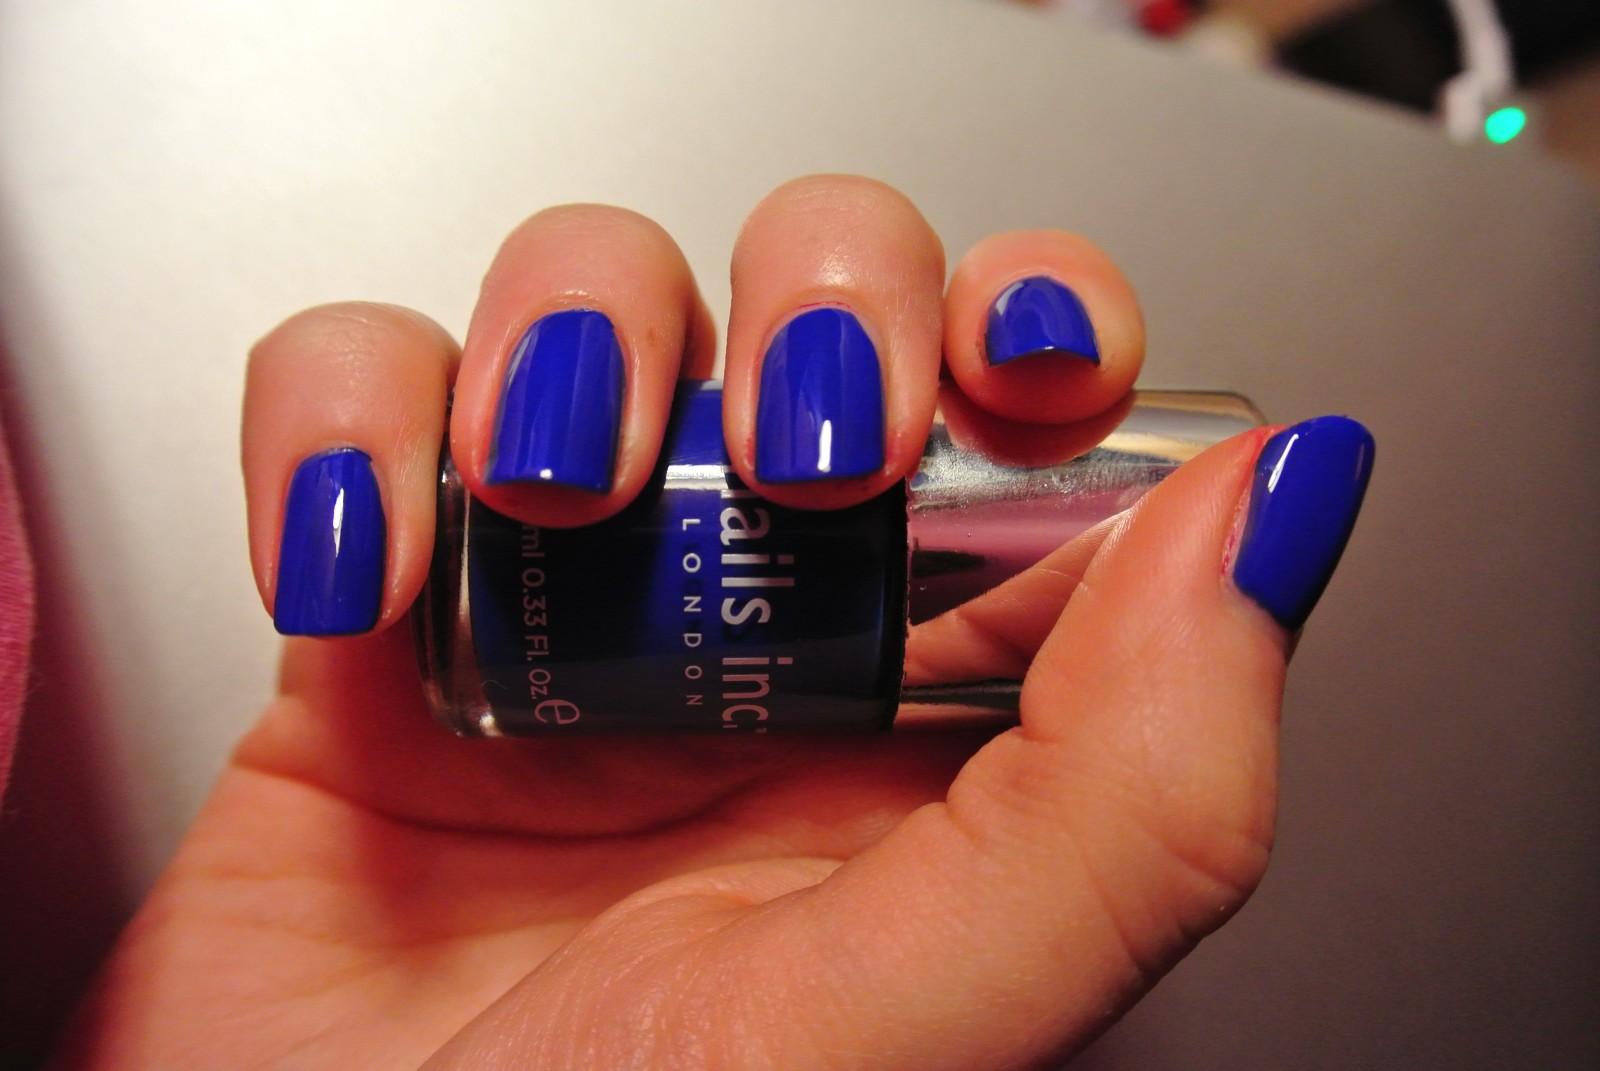 Nails Inc. Baker Street